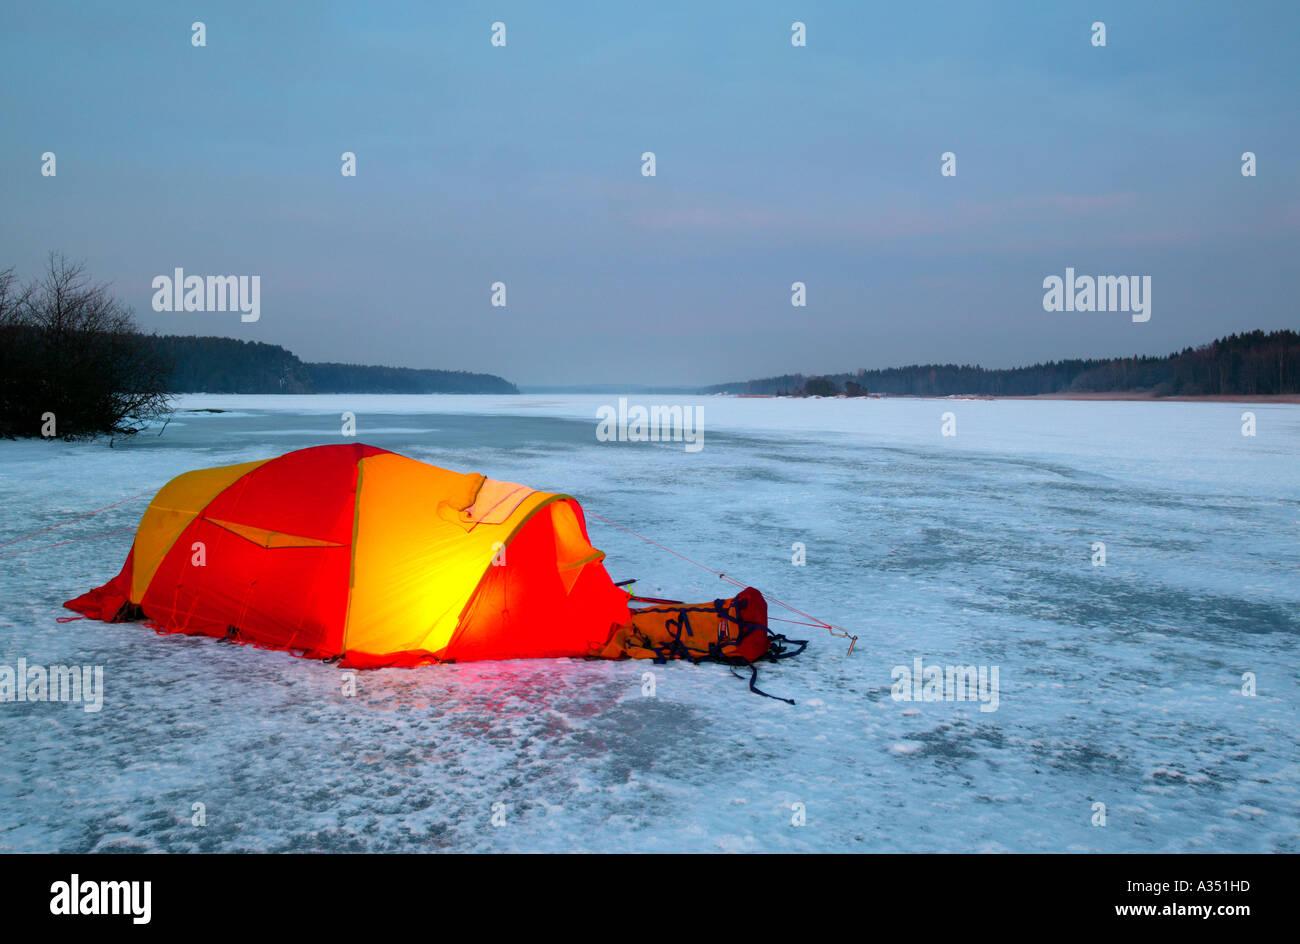 Winter camp a Vanemfjorden nel lago Vansjø, Rygge kommune, Østfold fylke, Norvegia. Immagini Stock